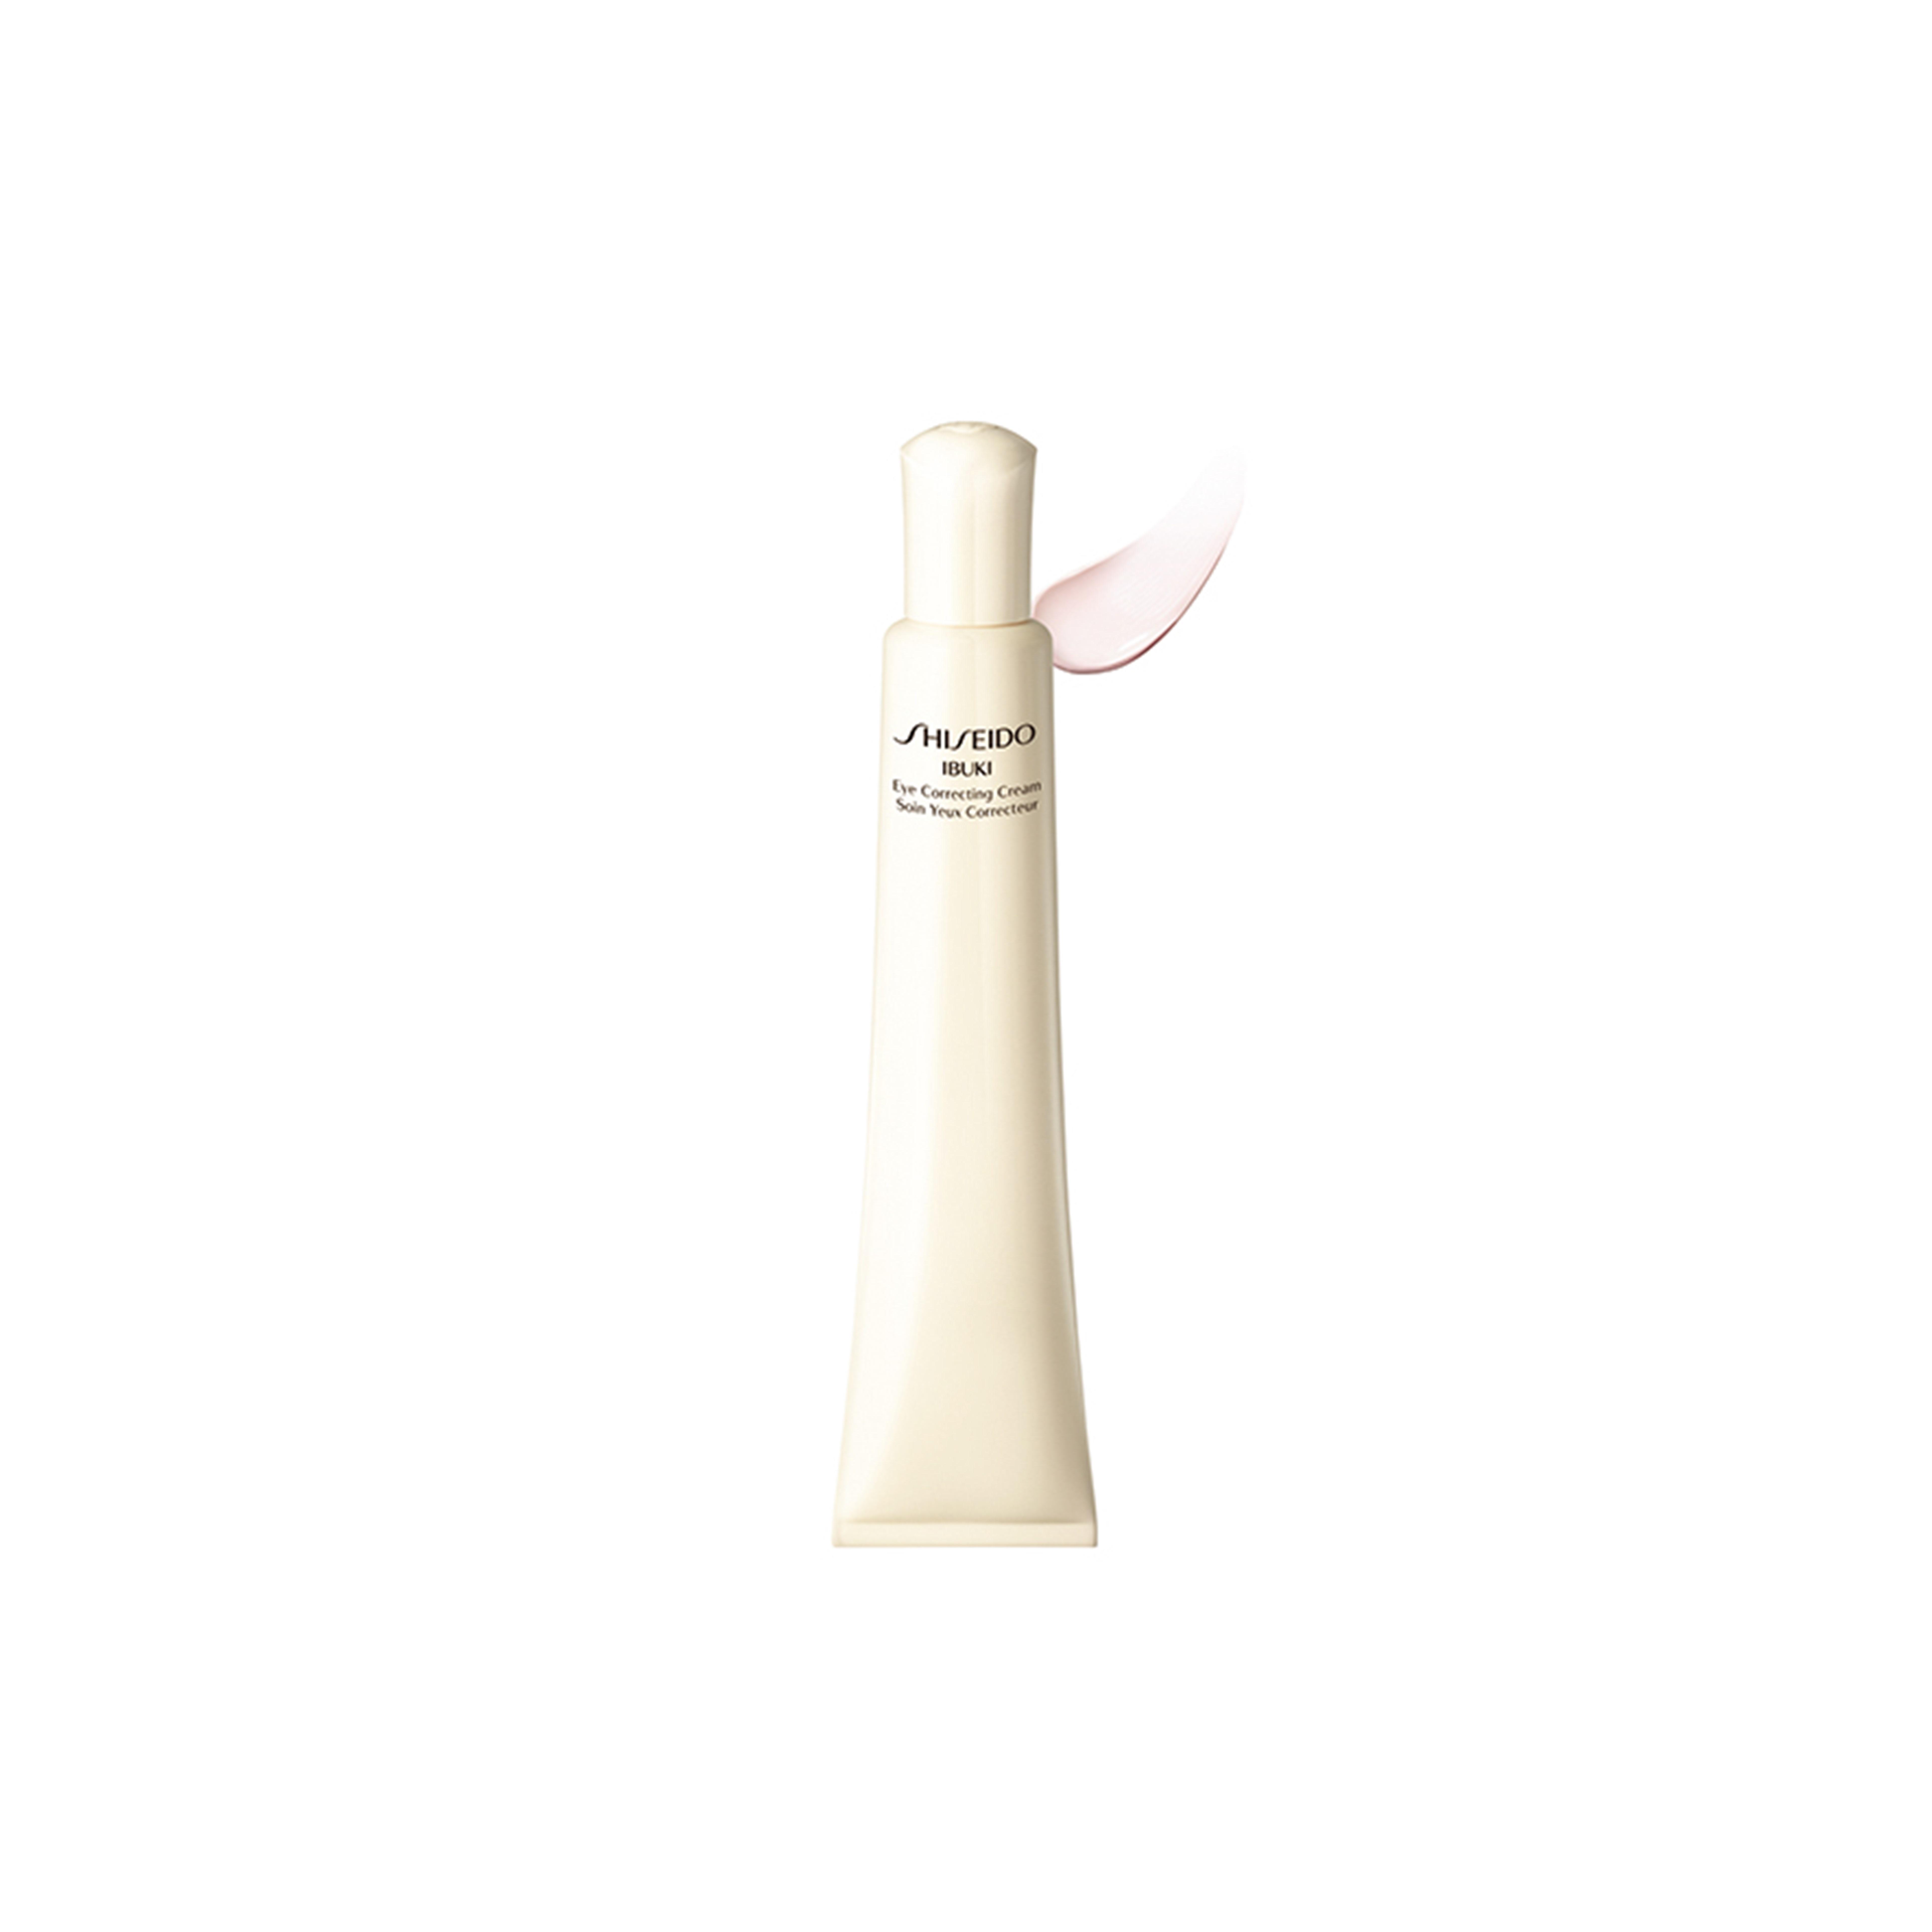 Shiseido Ibuki Eye Correcting Cream, 15 ml